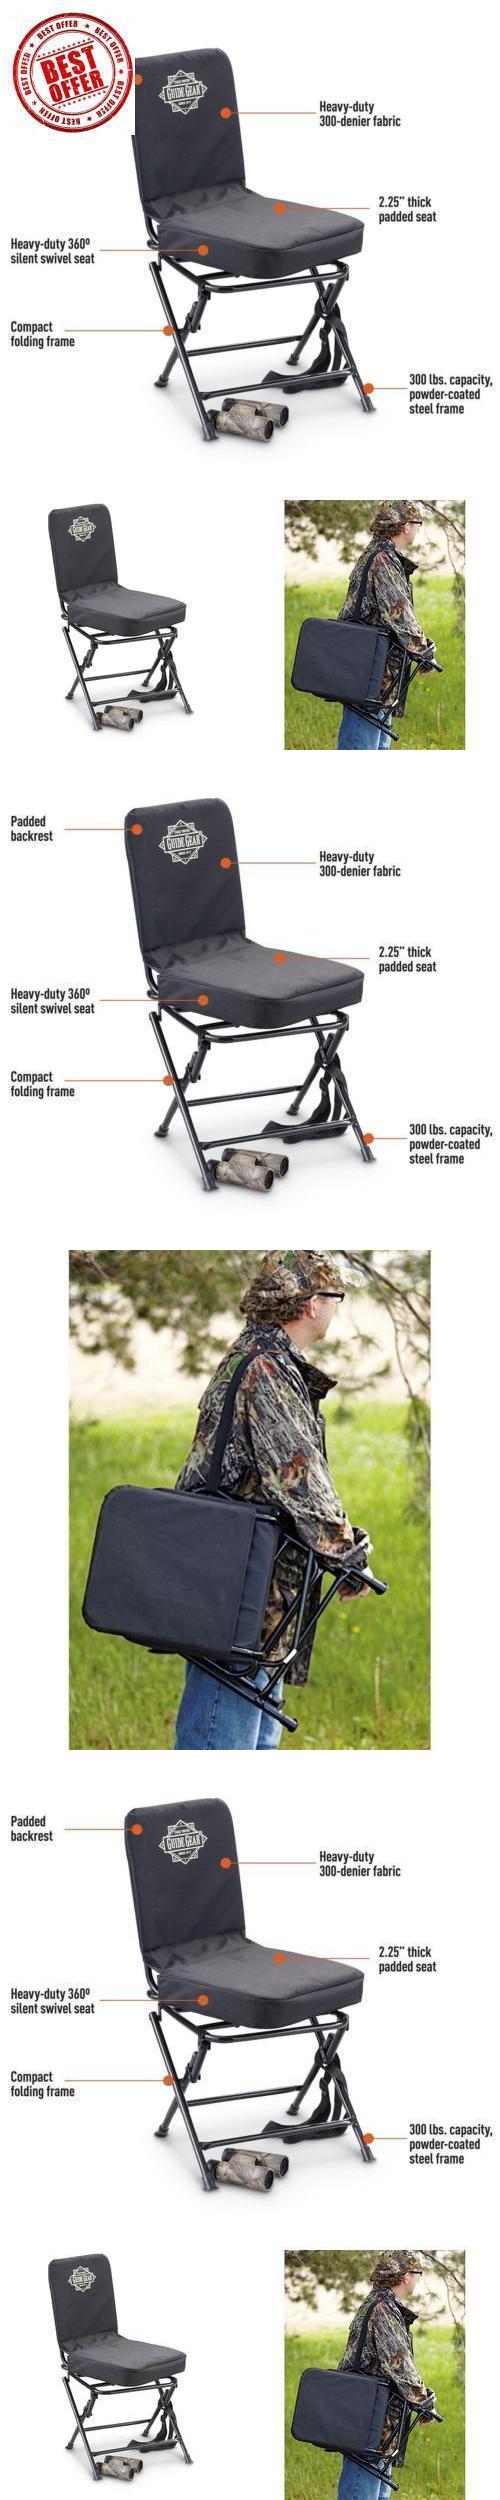 portable hunting chair vanity table swivel folding deer stool turkey padded blind seat back